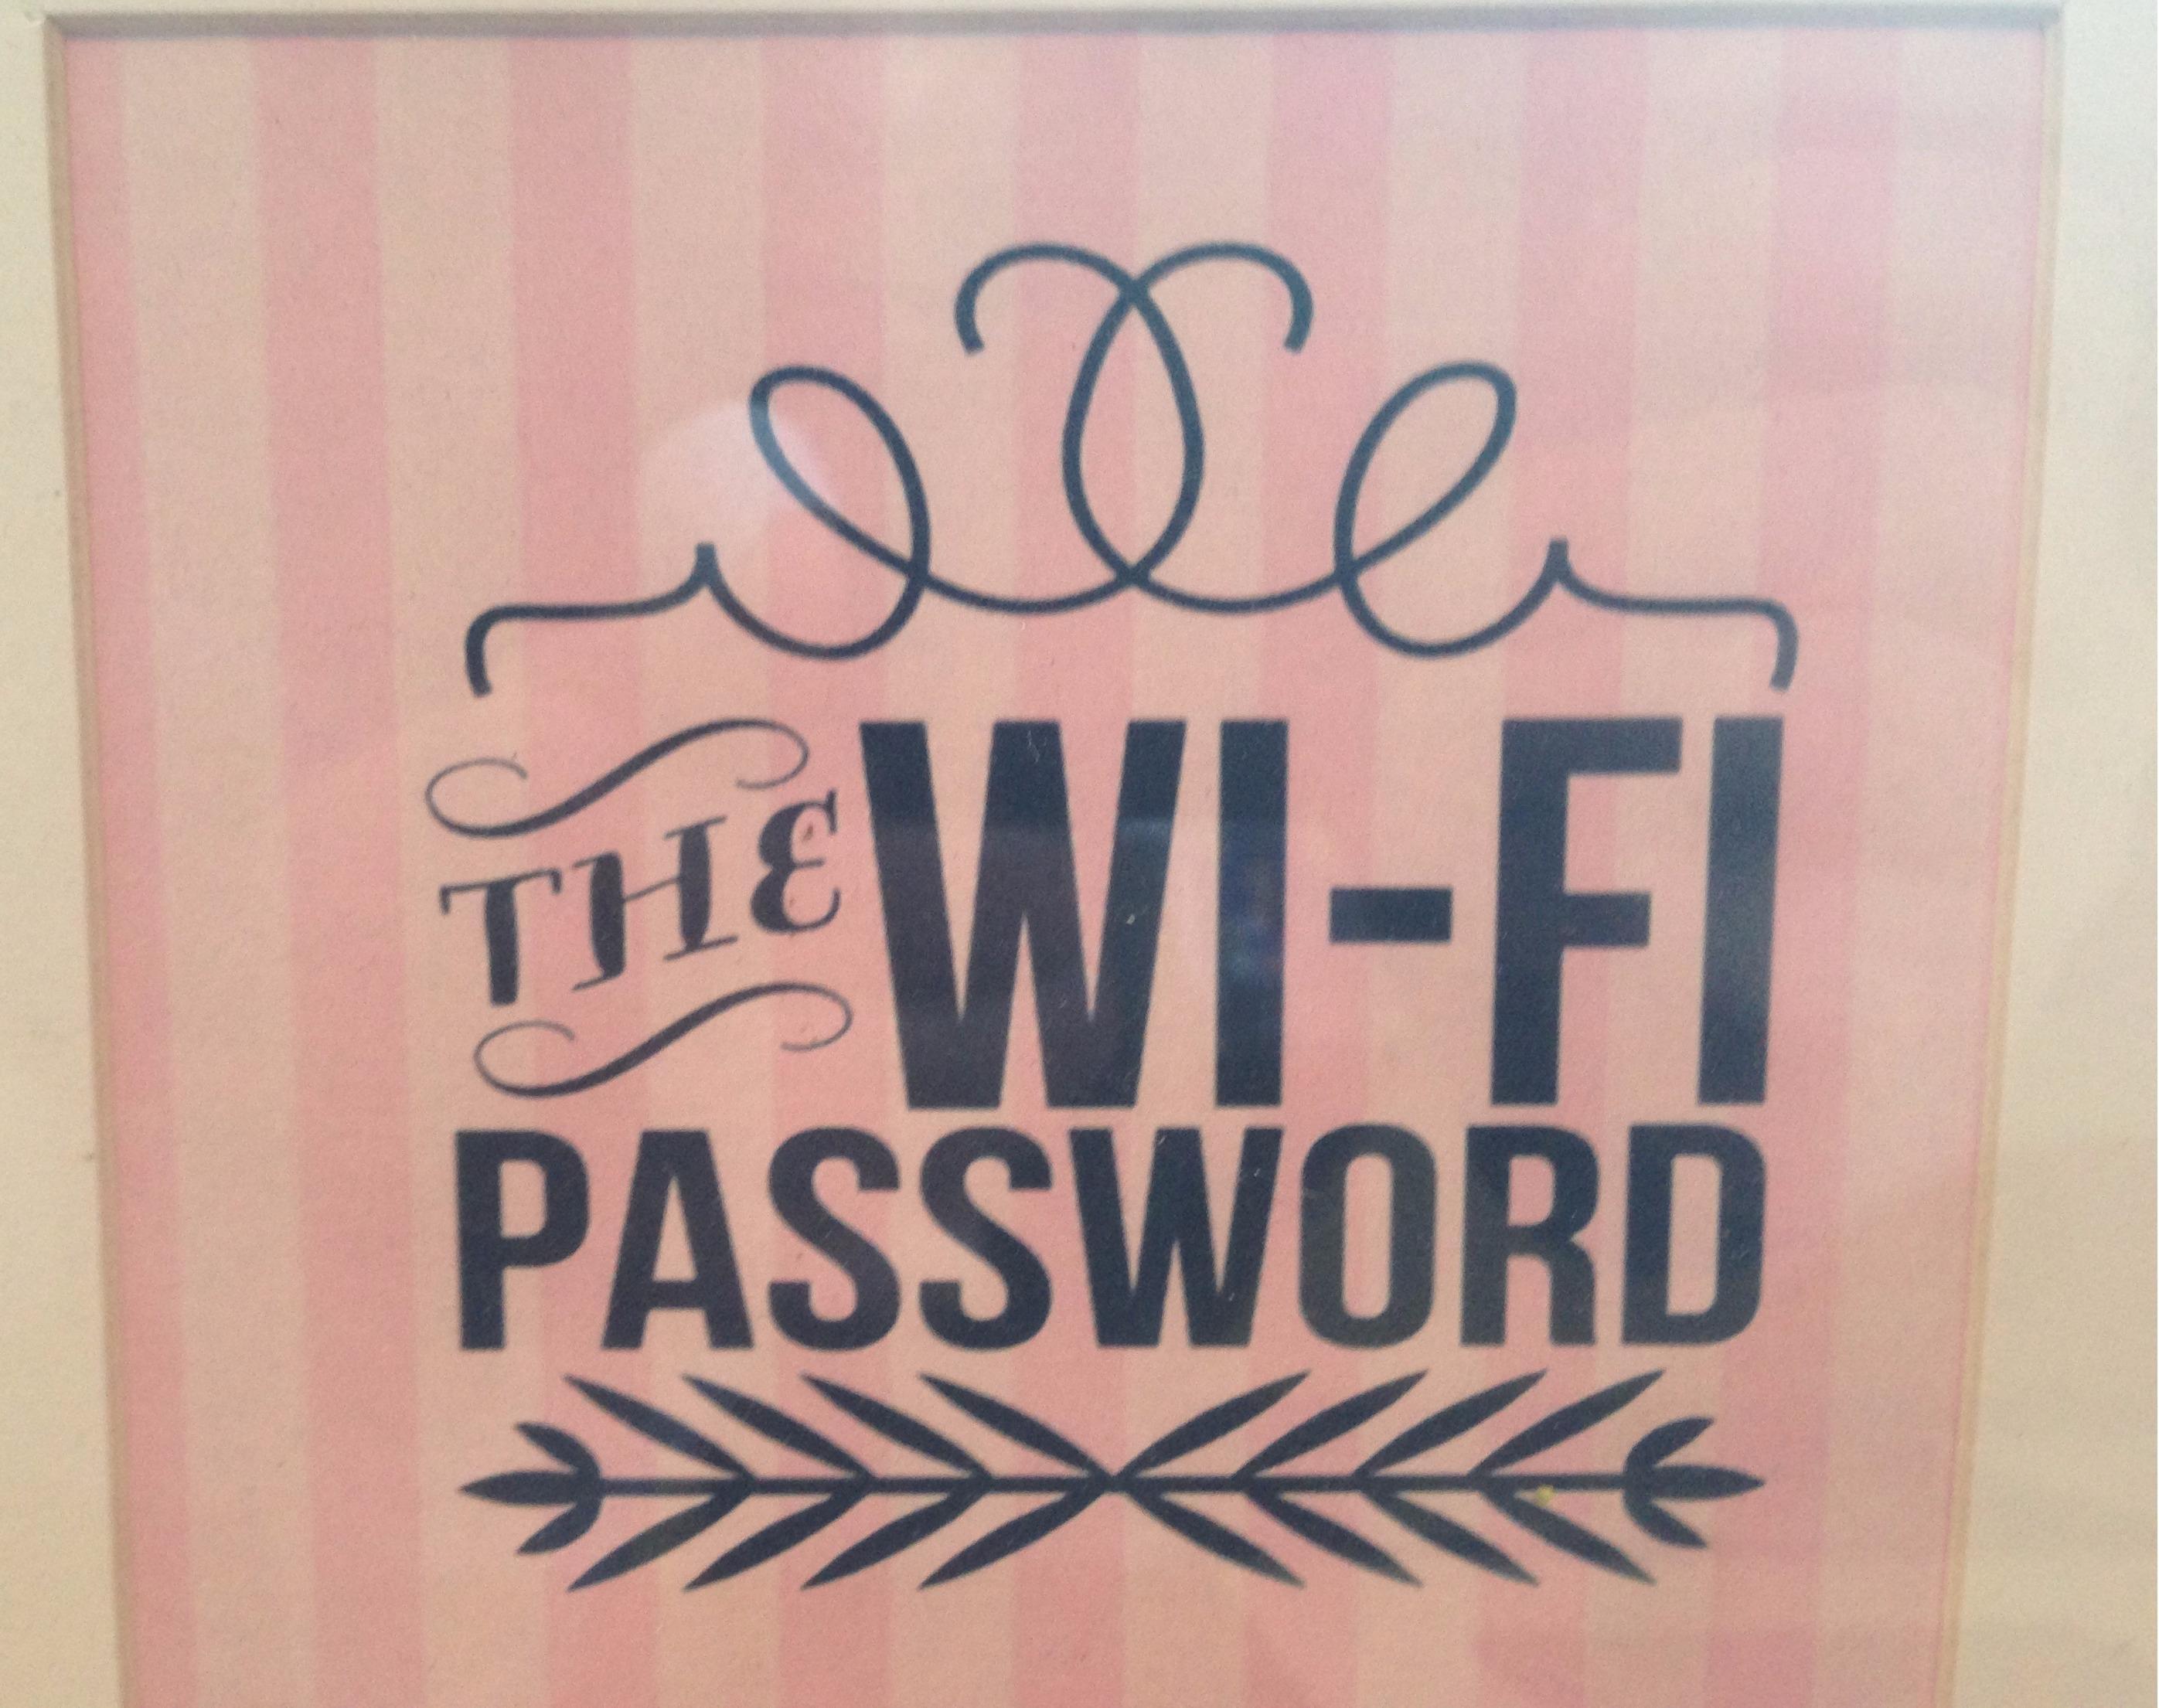 Free WiFi! Soto Loft and Signature Spa Perrysburg (419)872-5555